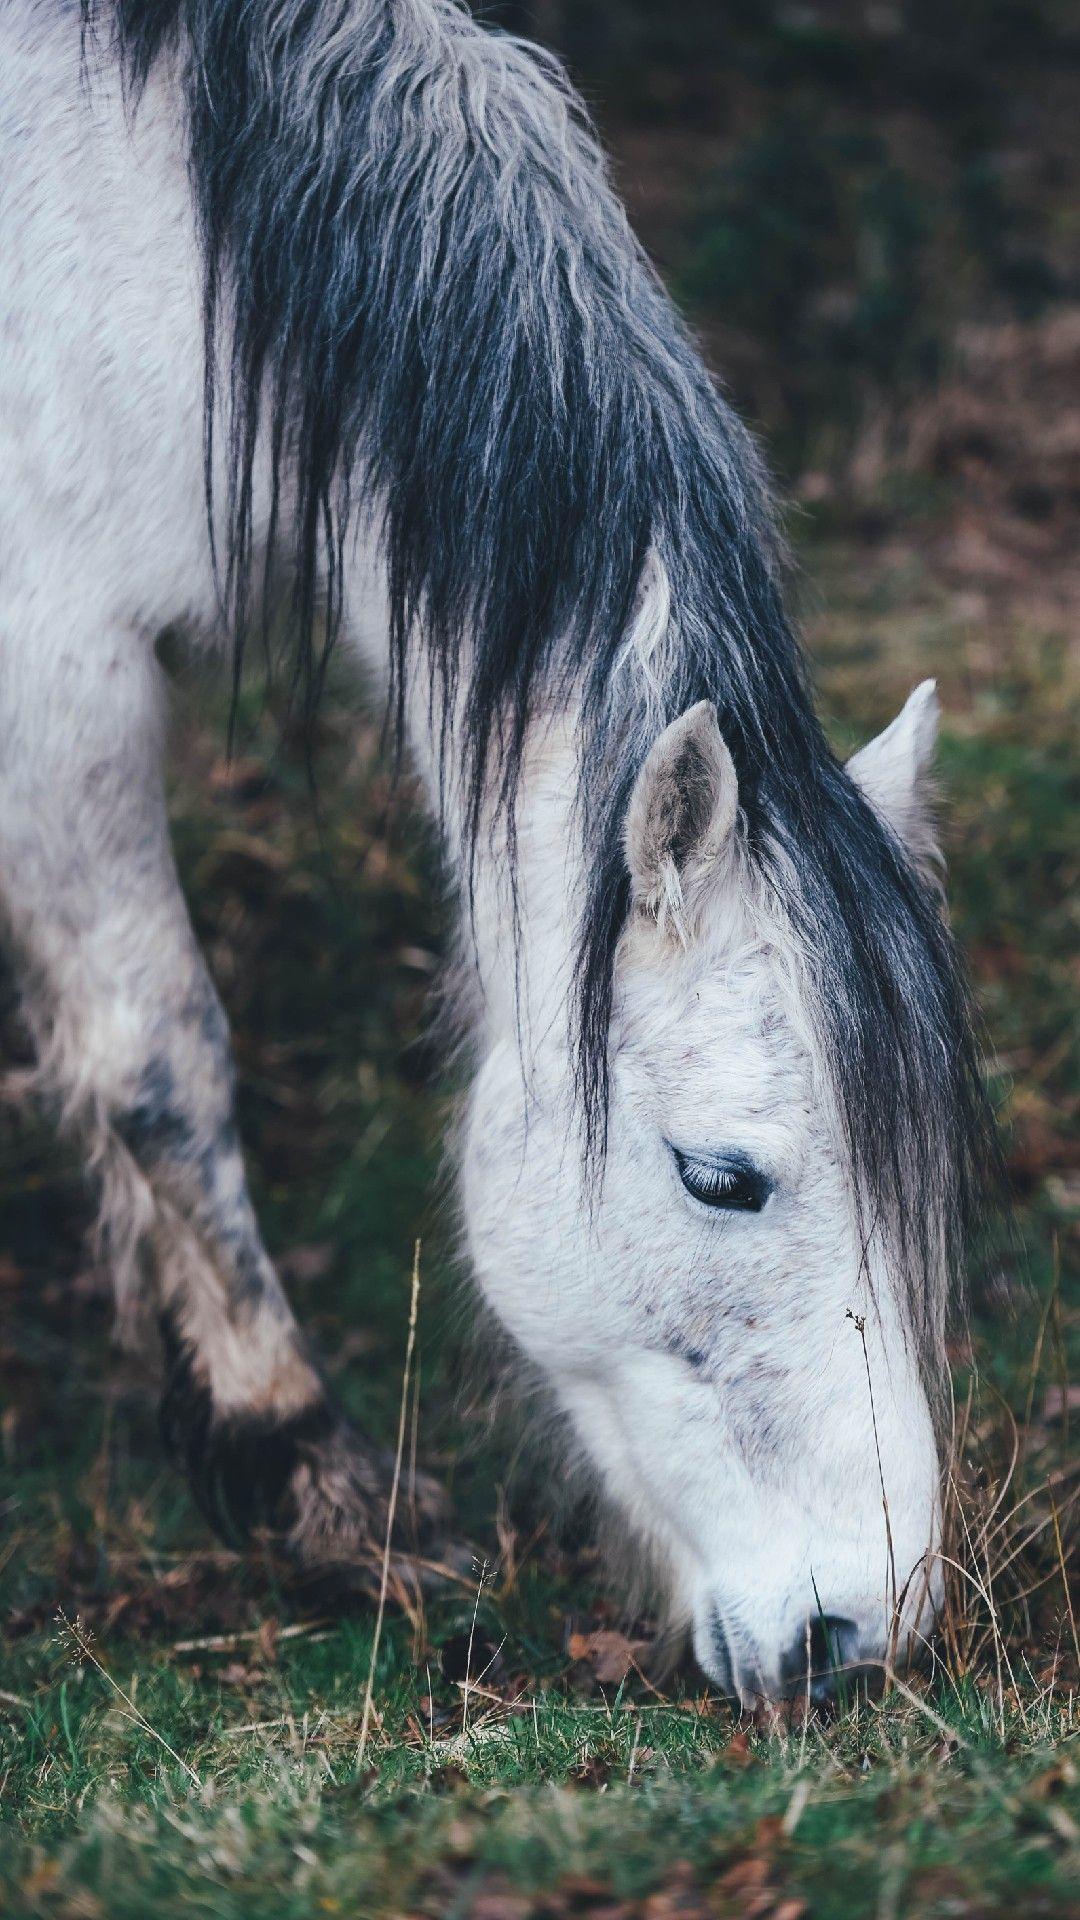 Horse Wallpaper Iphone 8